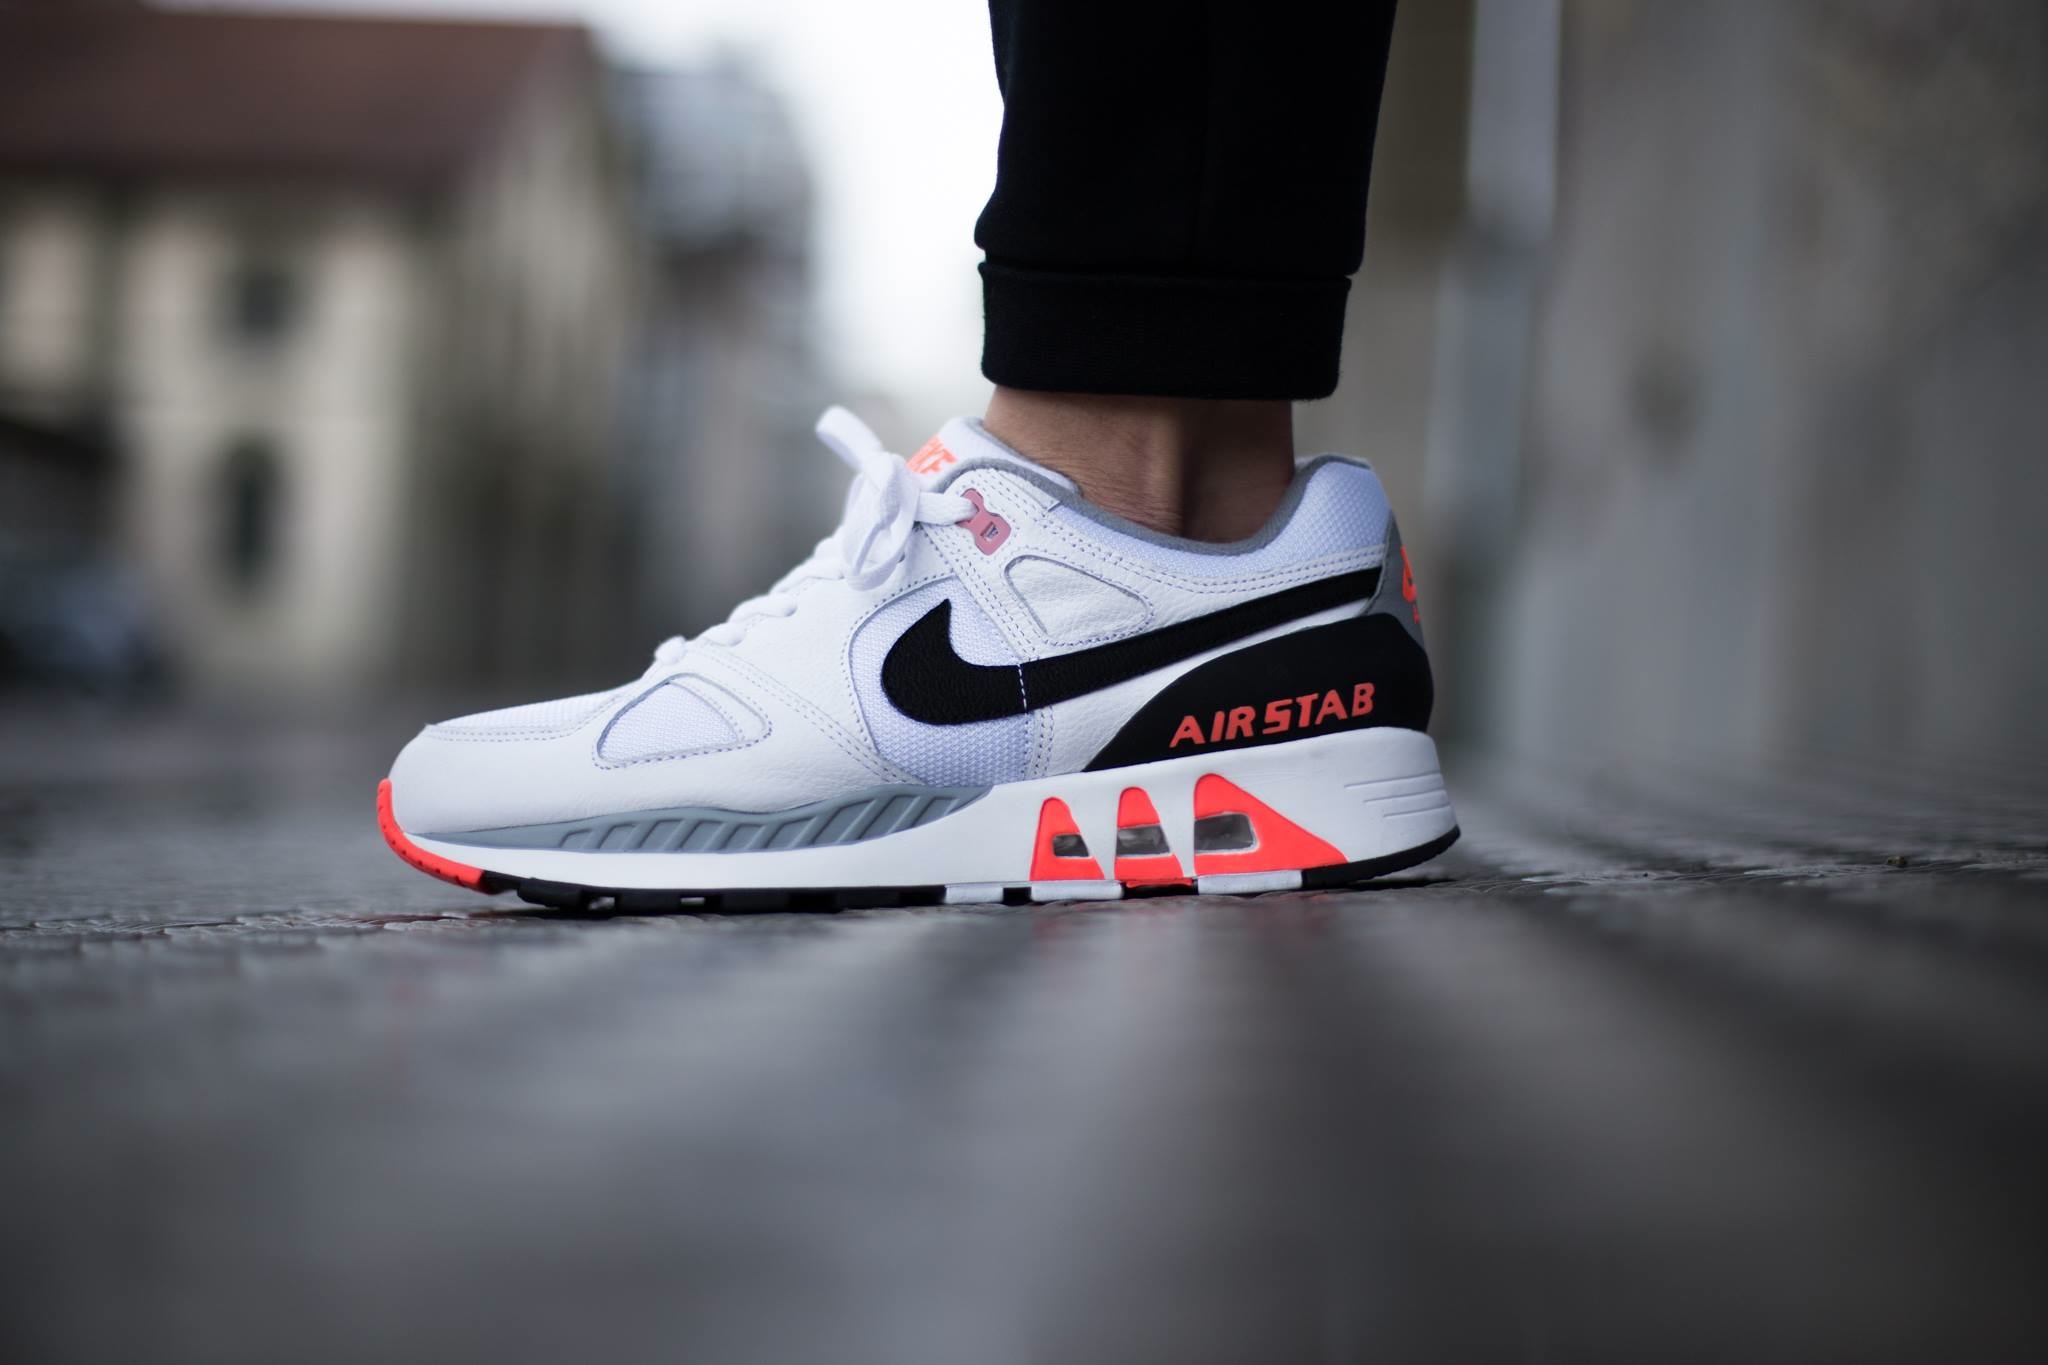 Nike-Air-Stab-Infrared-1